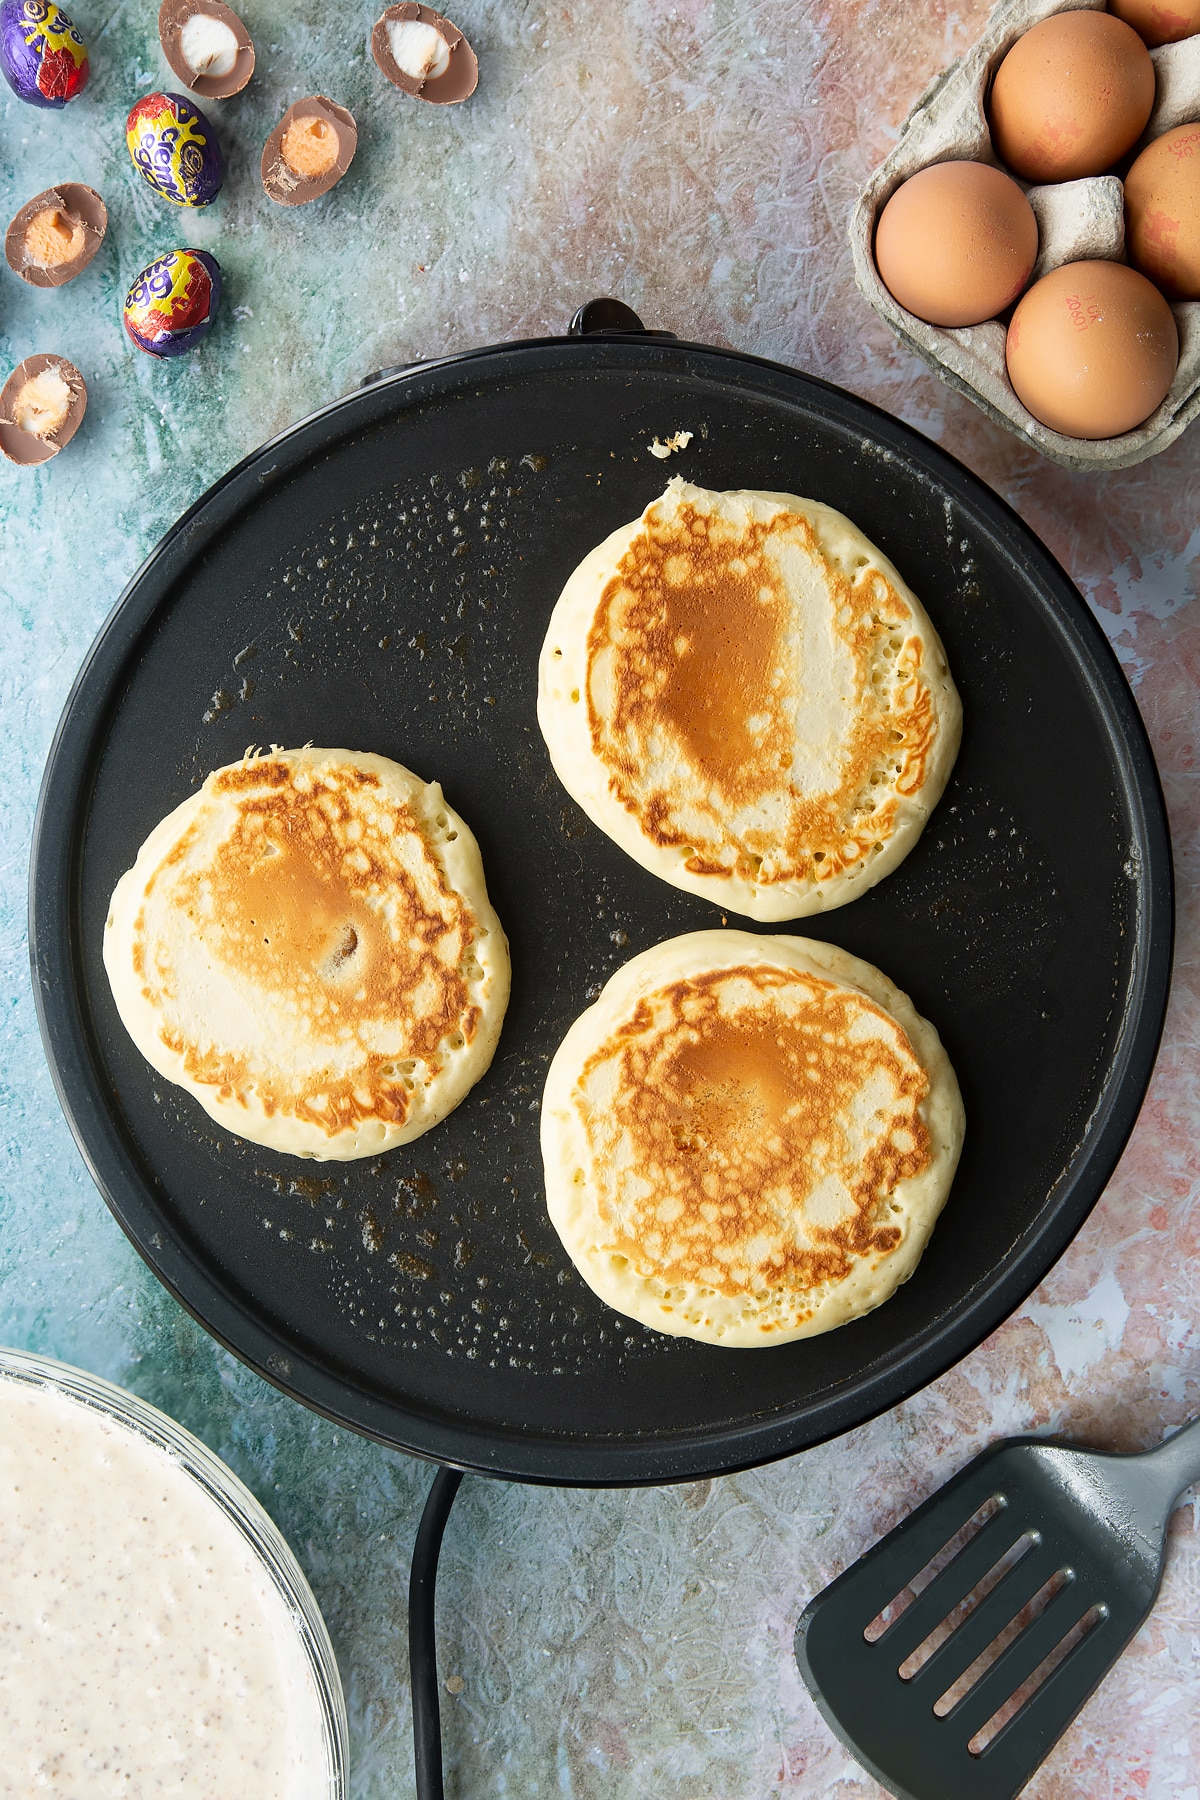 A hot pan with Creme Egg pancakes fully cooked. Ingredients to make Creme Egg pancakes surround the pan.